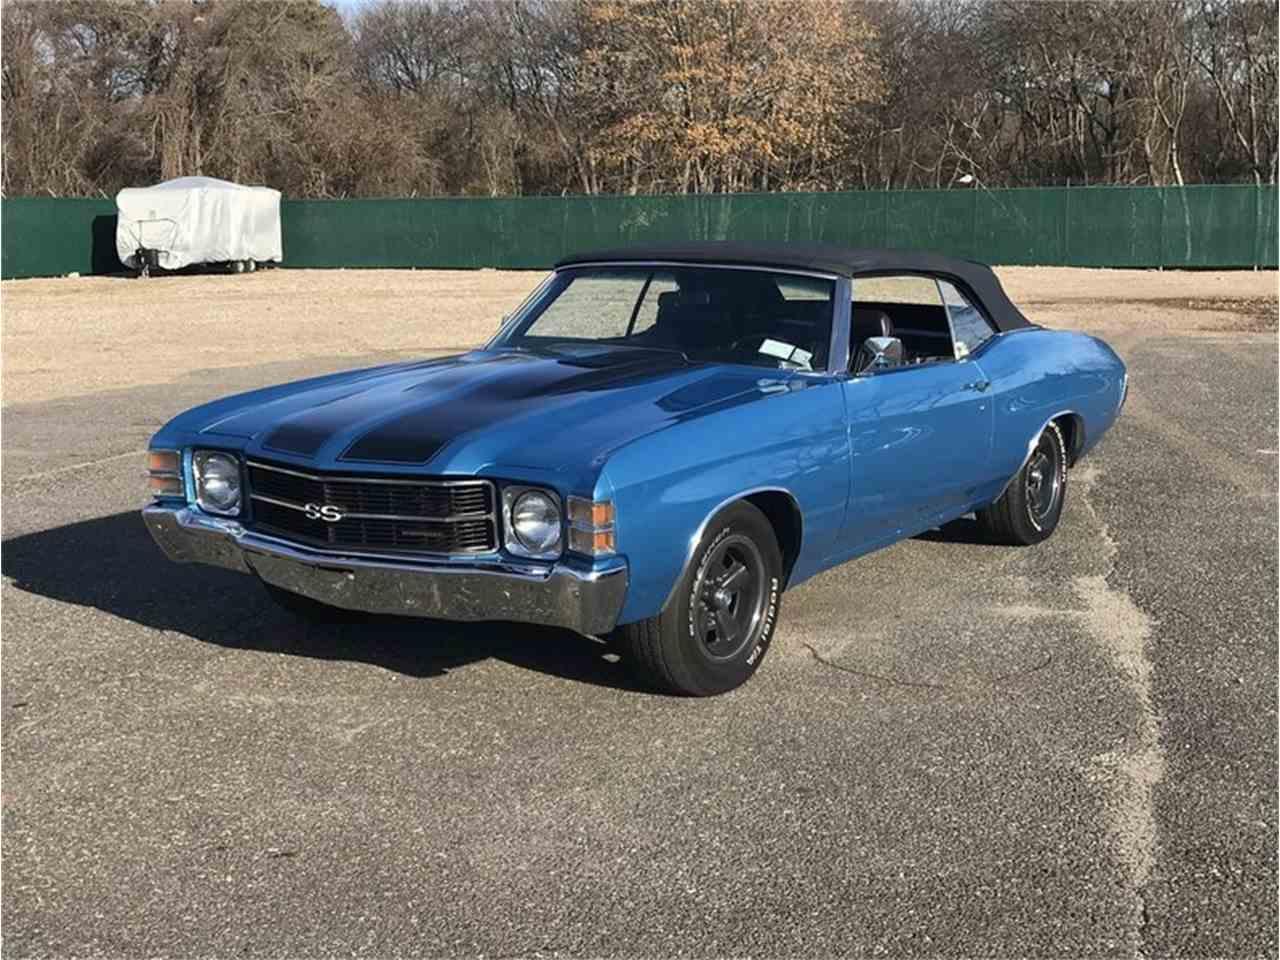 1971 Chevrolet Chevelle SS for Sale - CC-1044782